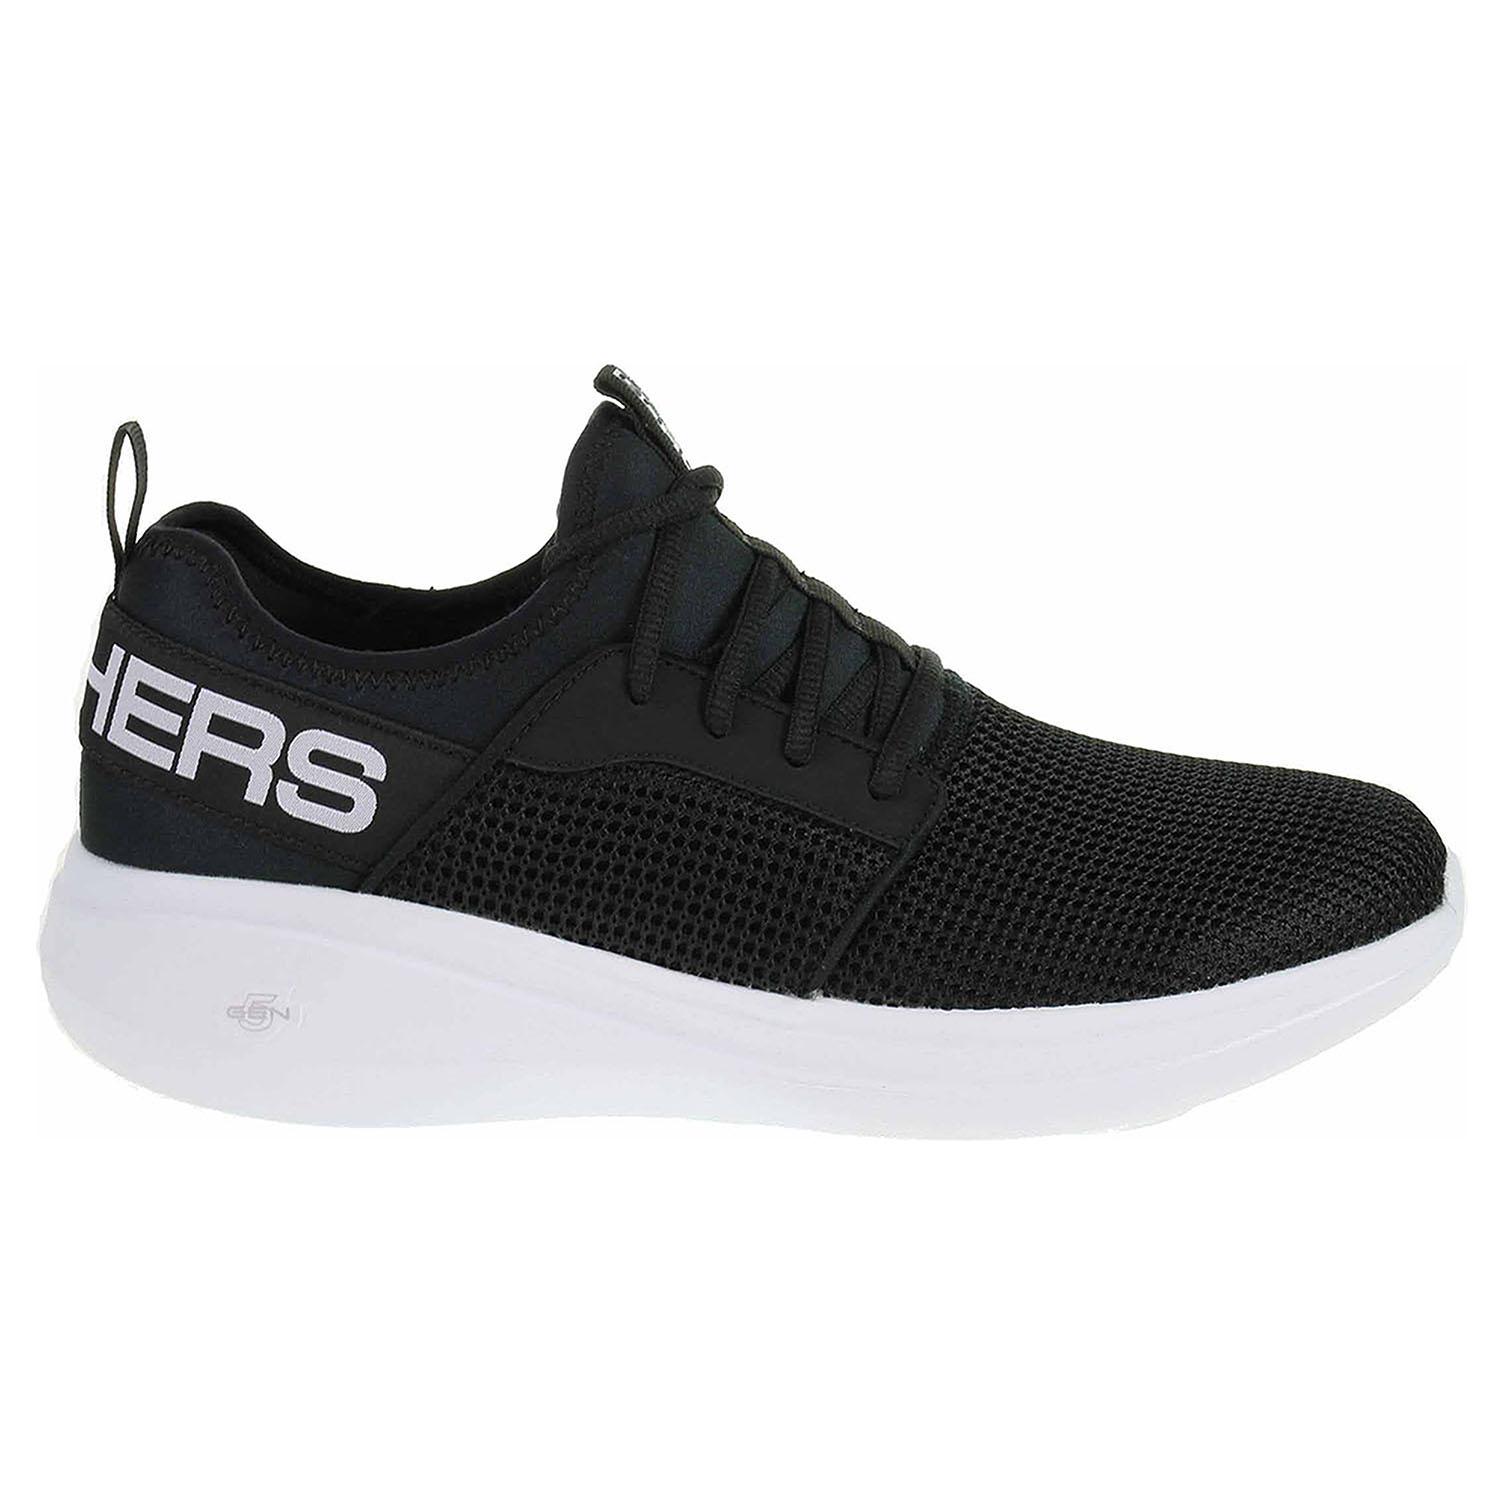 Ecco Skechers Go Run Fast - Valor black-white 24200224 997f2cf3ec